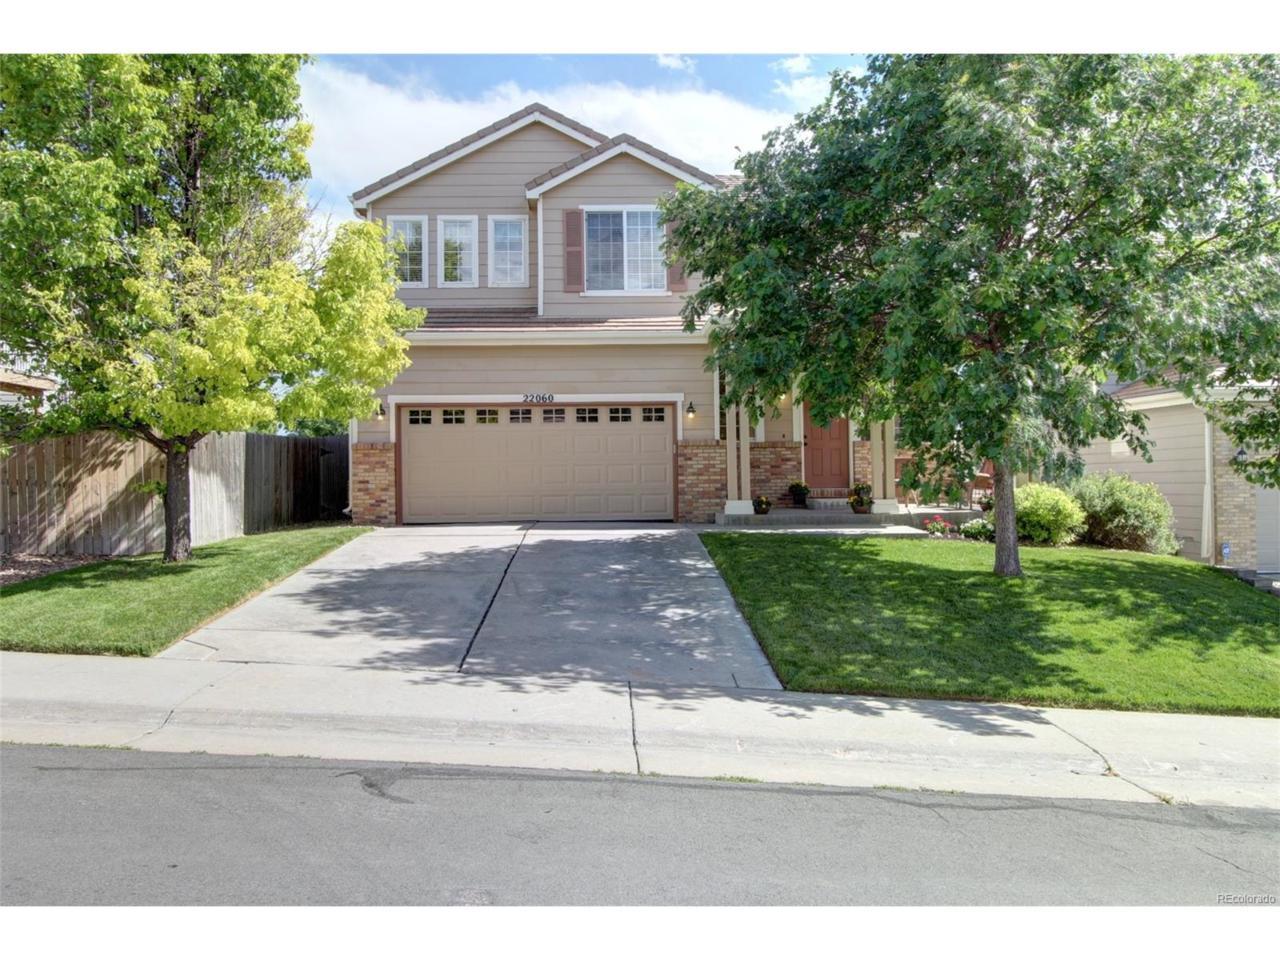 22060 E Belleview Place, Aurora, CO 80015 (MLS #5299205) :: 8z Real Estate